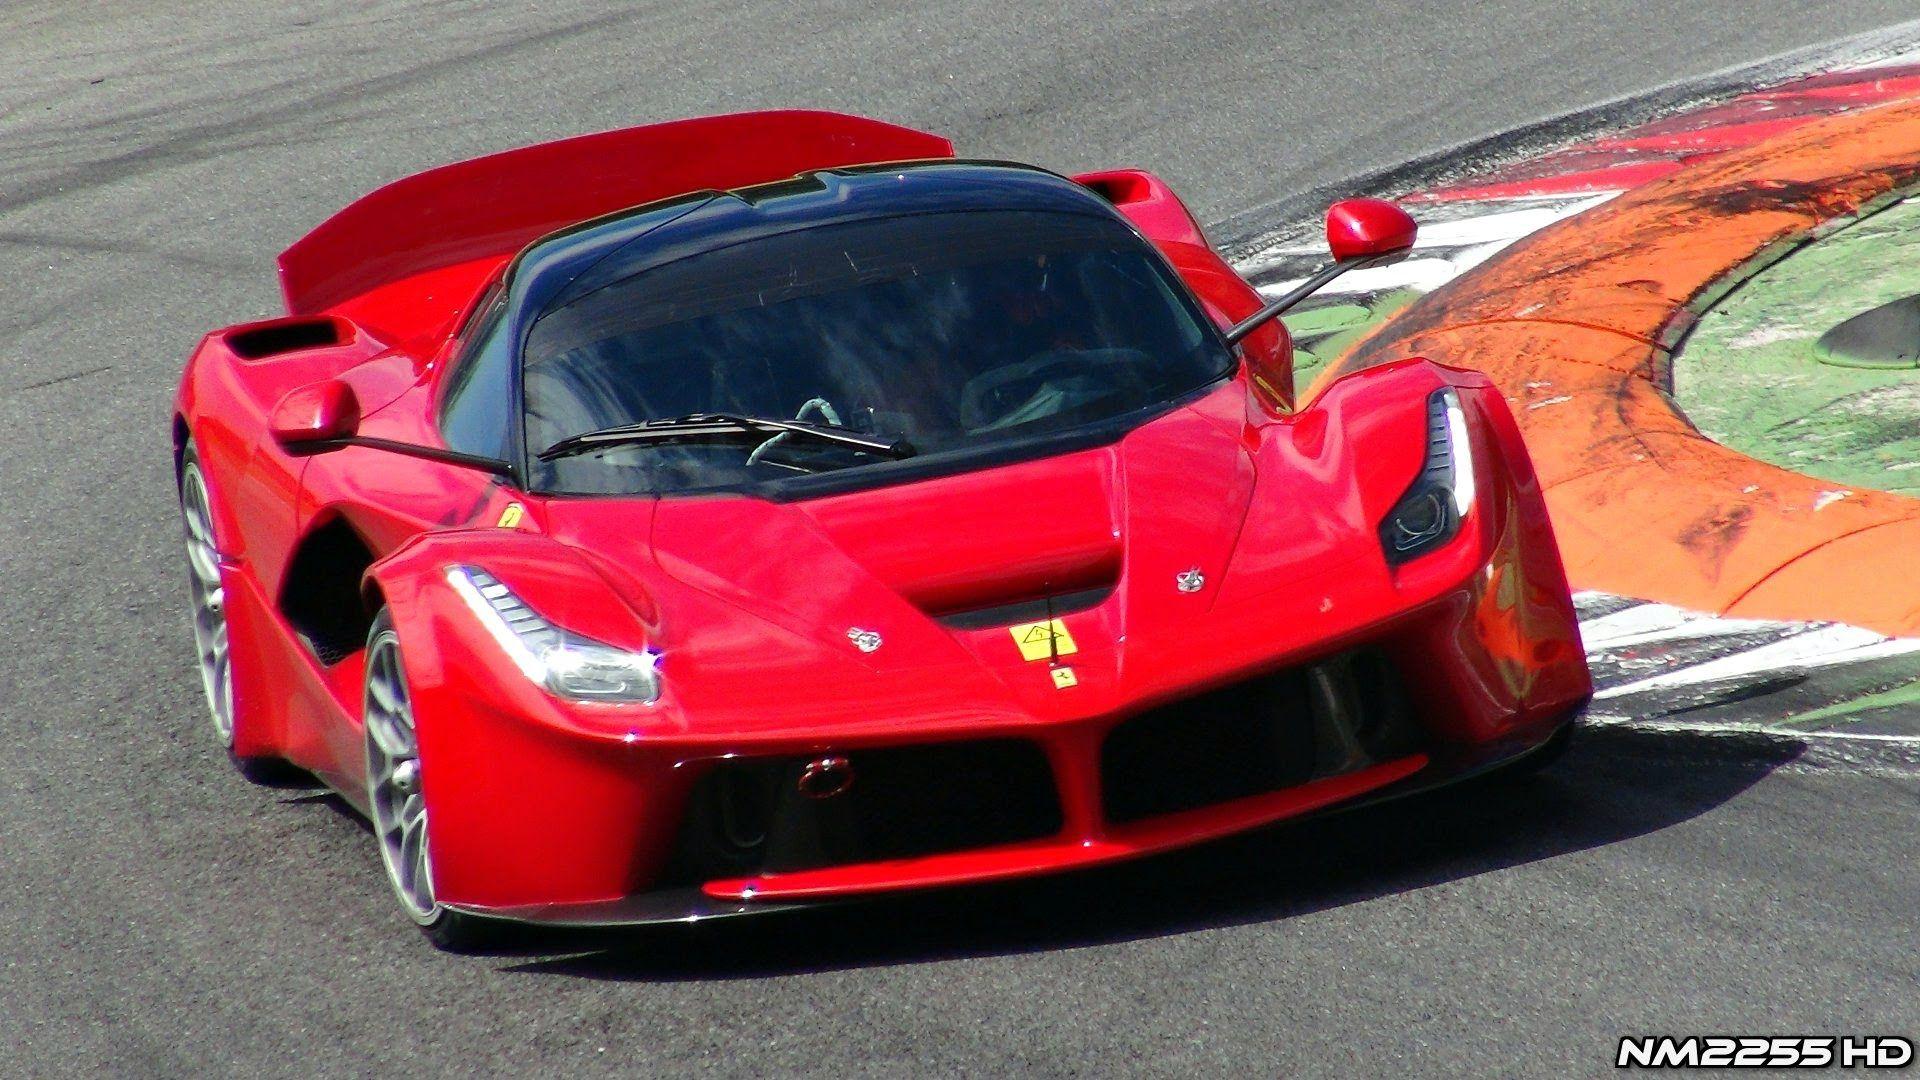 Ferrari LaFerrari XX Testing with EPIC Sound!! | cars, all